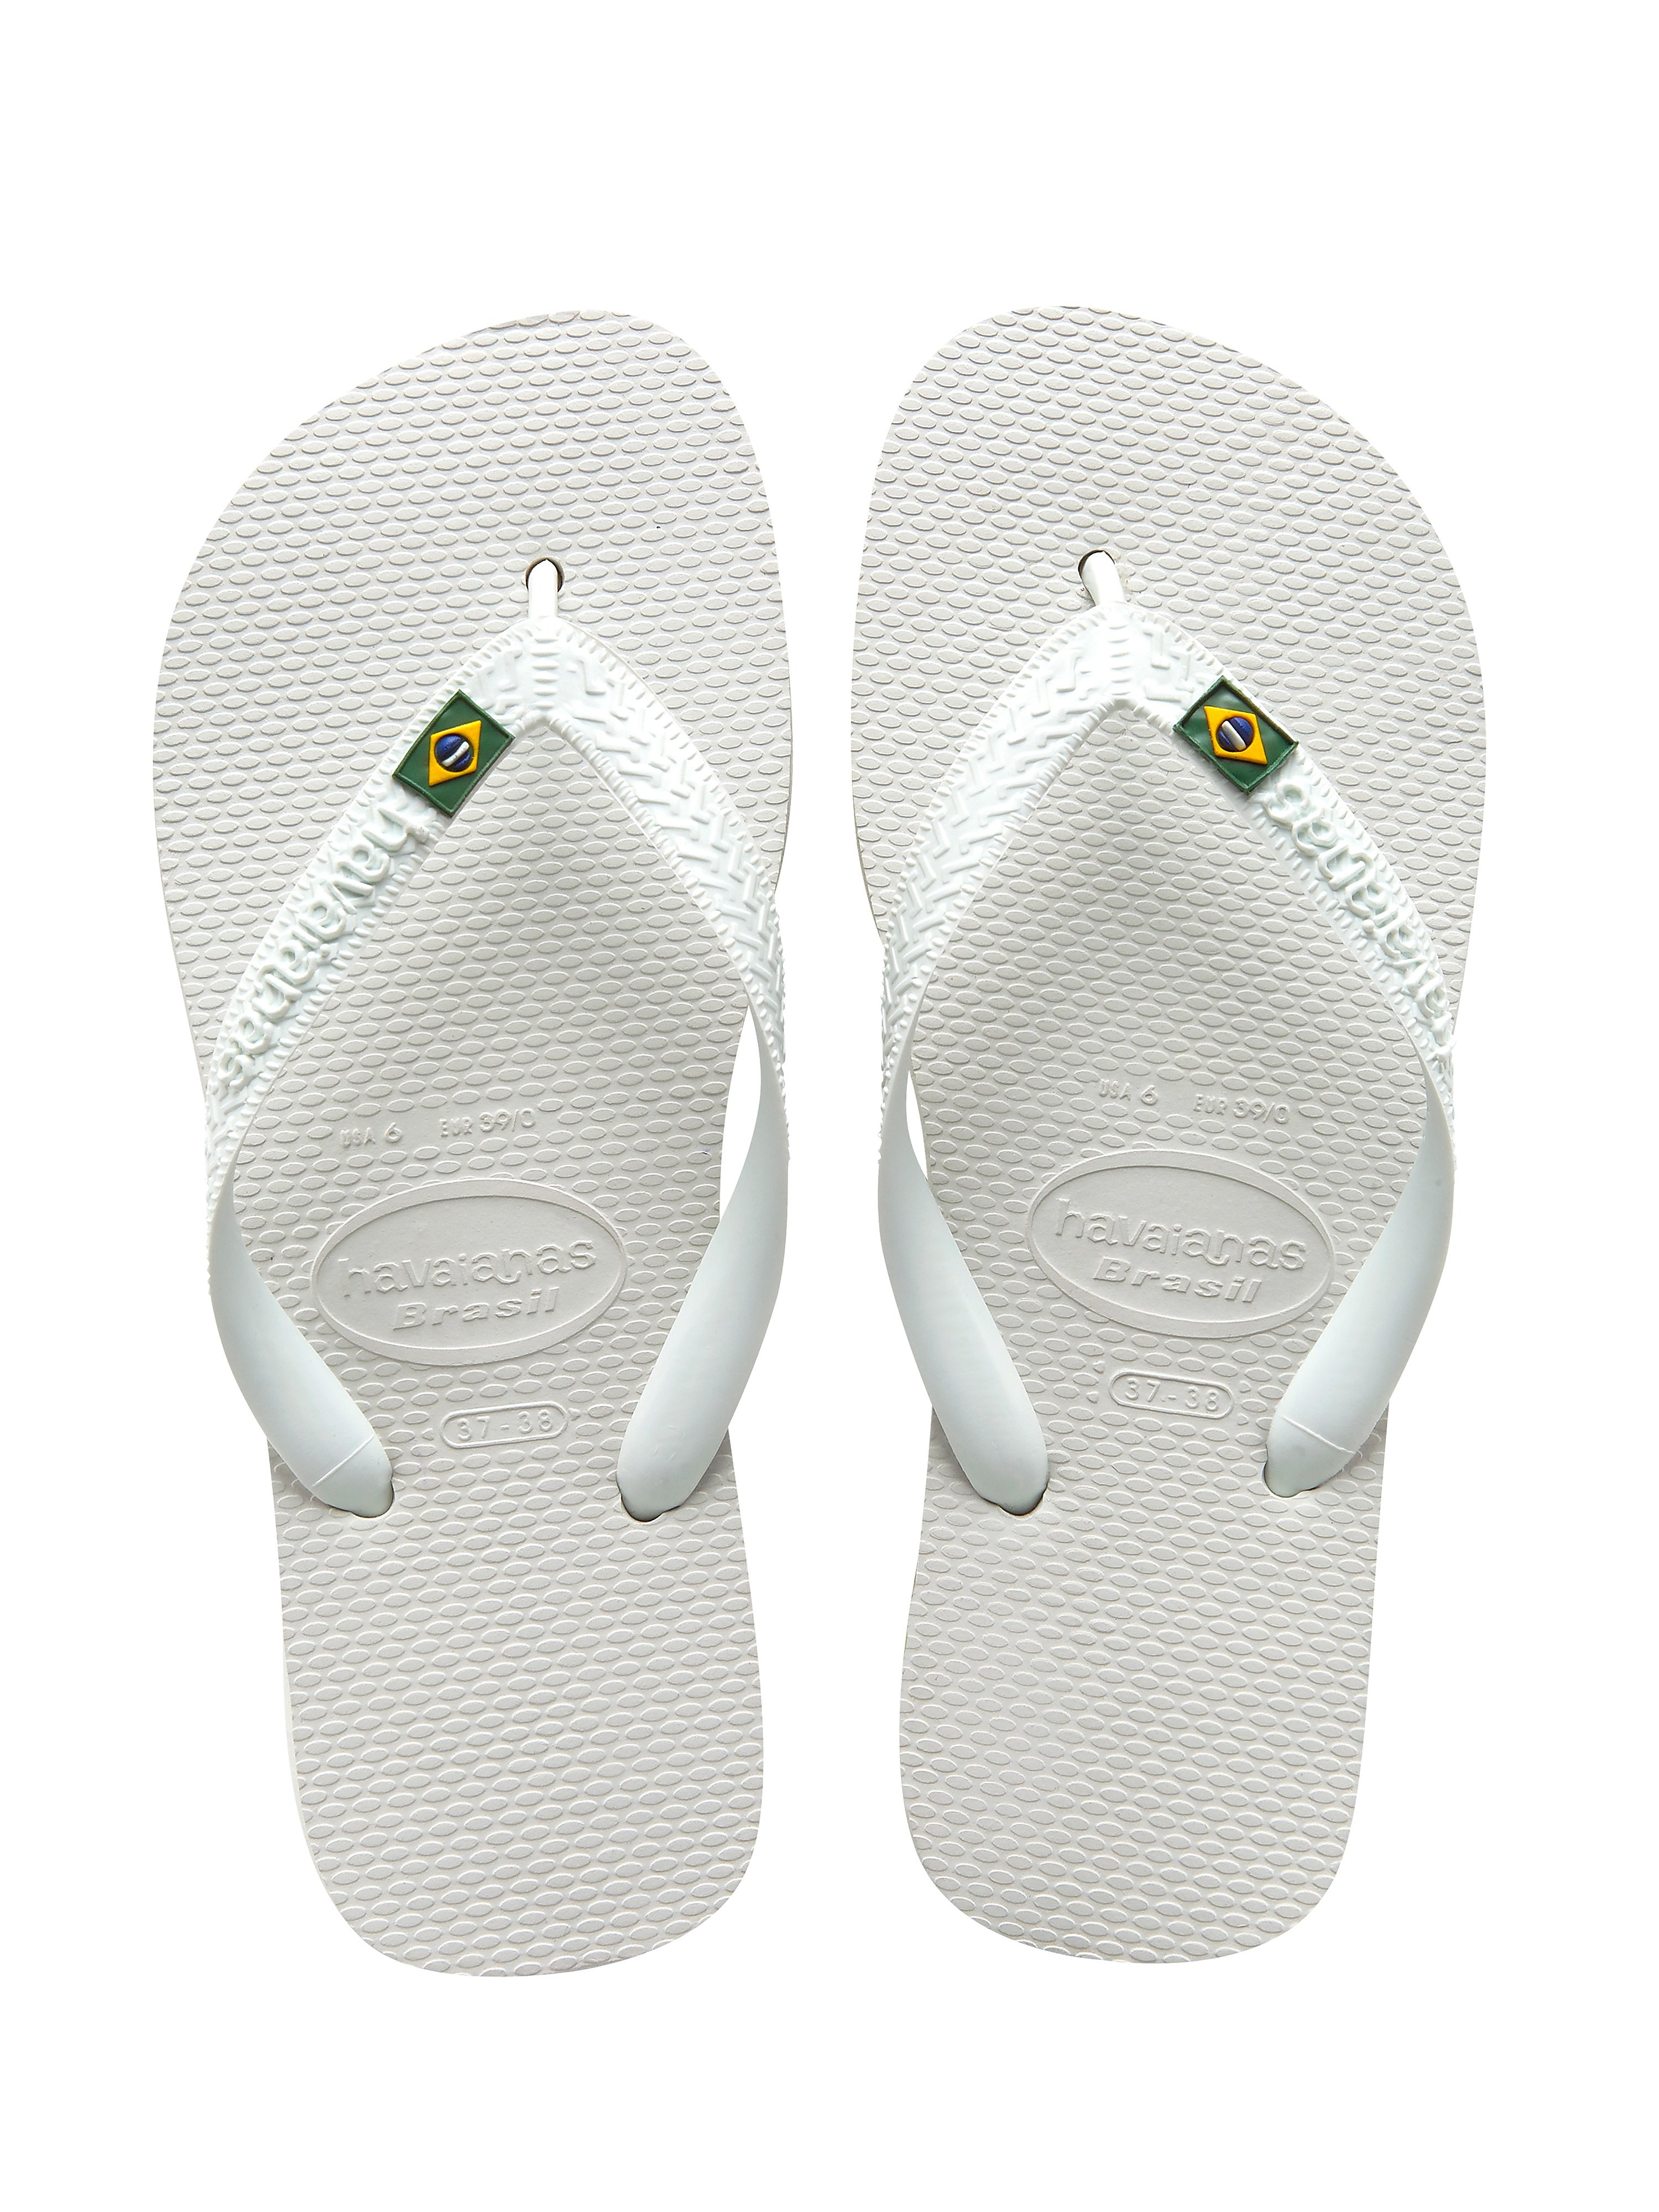 Havaianas Brazil Logo Flip Flops - White